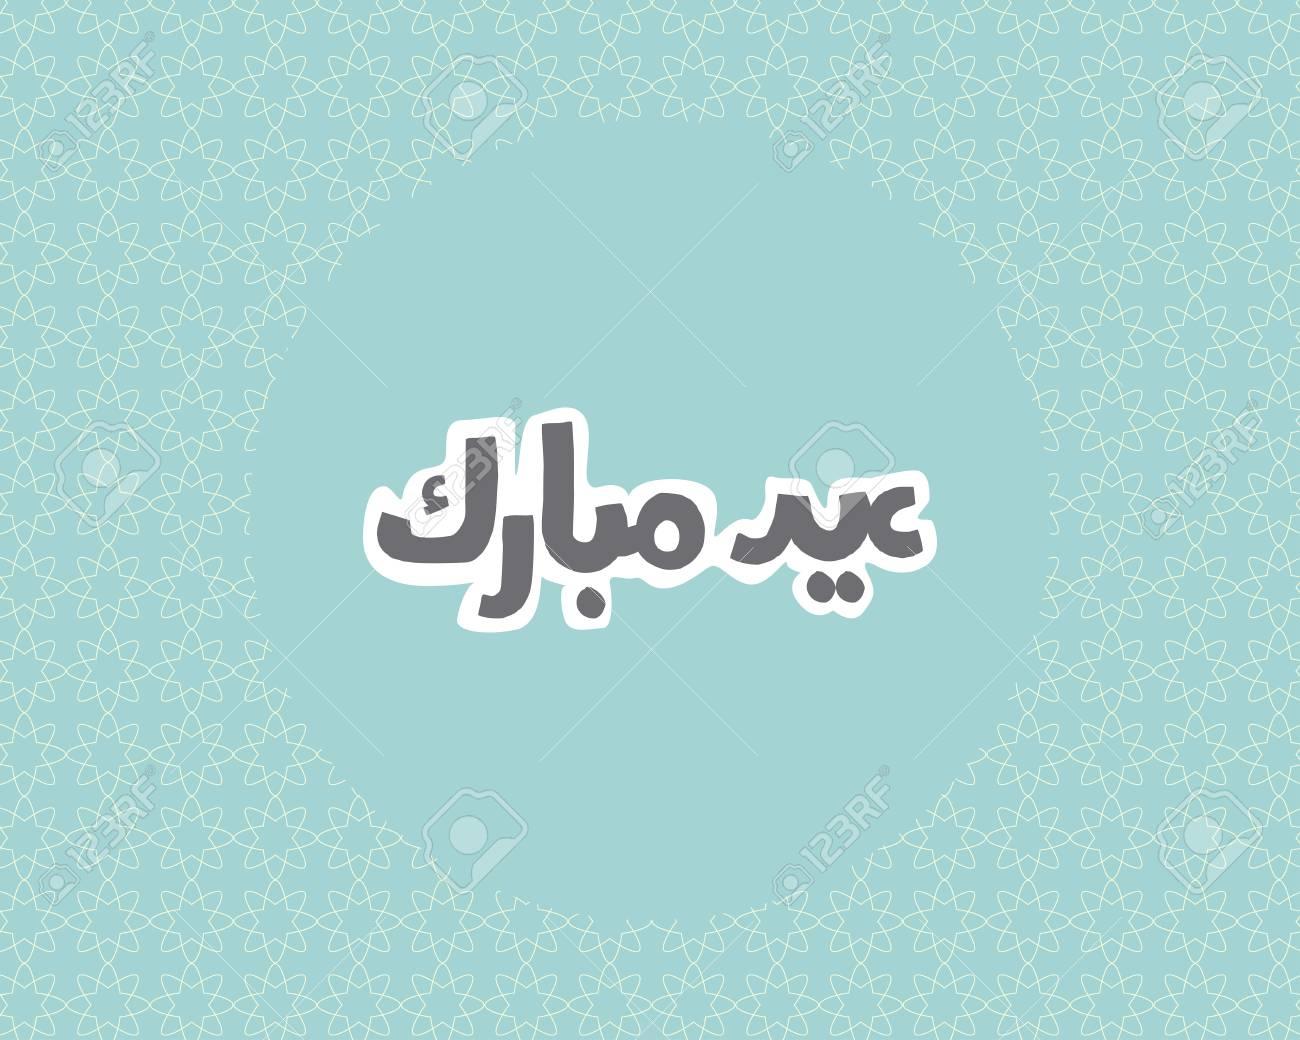 Eid Mubarak Or Salam Aidilfitri In Arabic Text Greetings Royalty